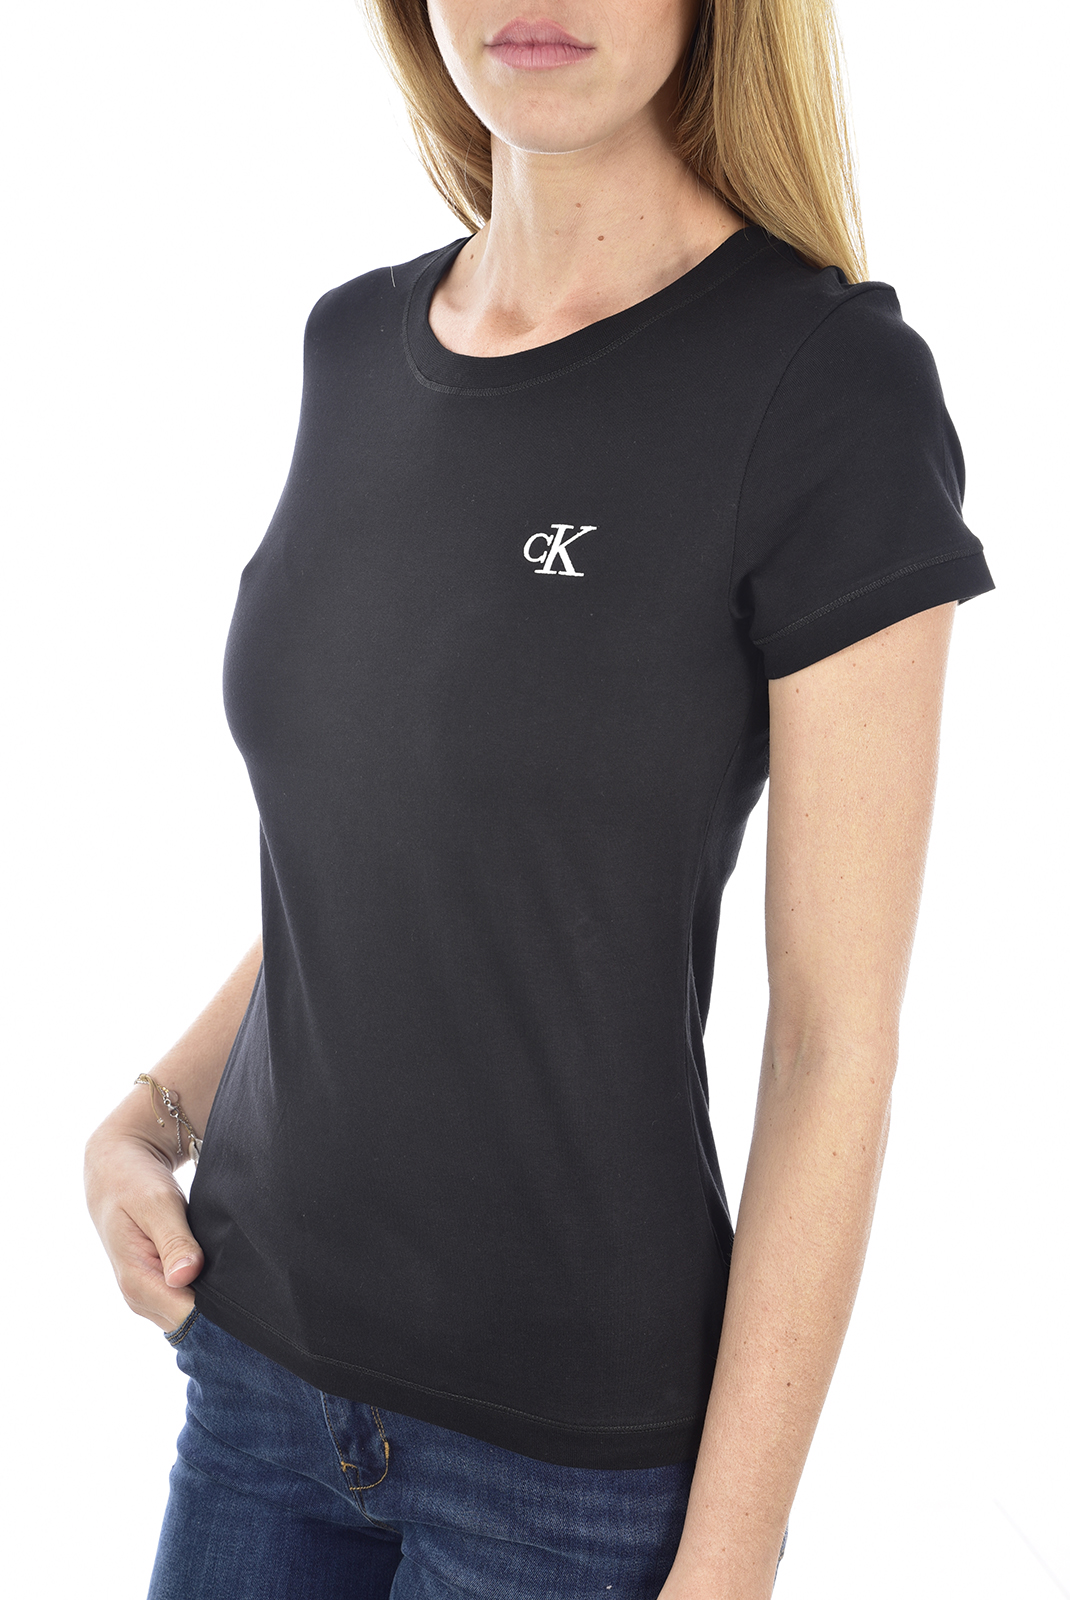 Tee shirt  Calvin klein J20J212883 EMBROIDERY BAE CK BLACK